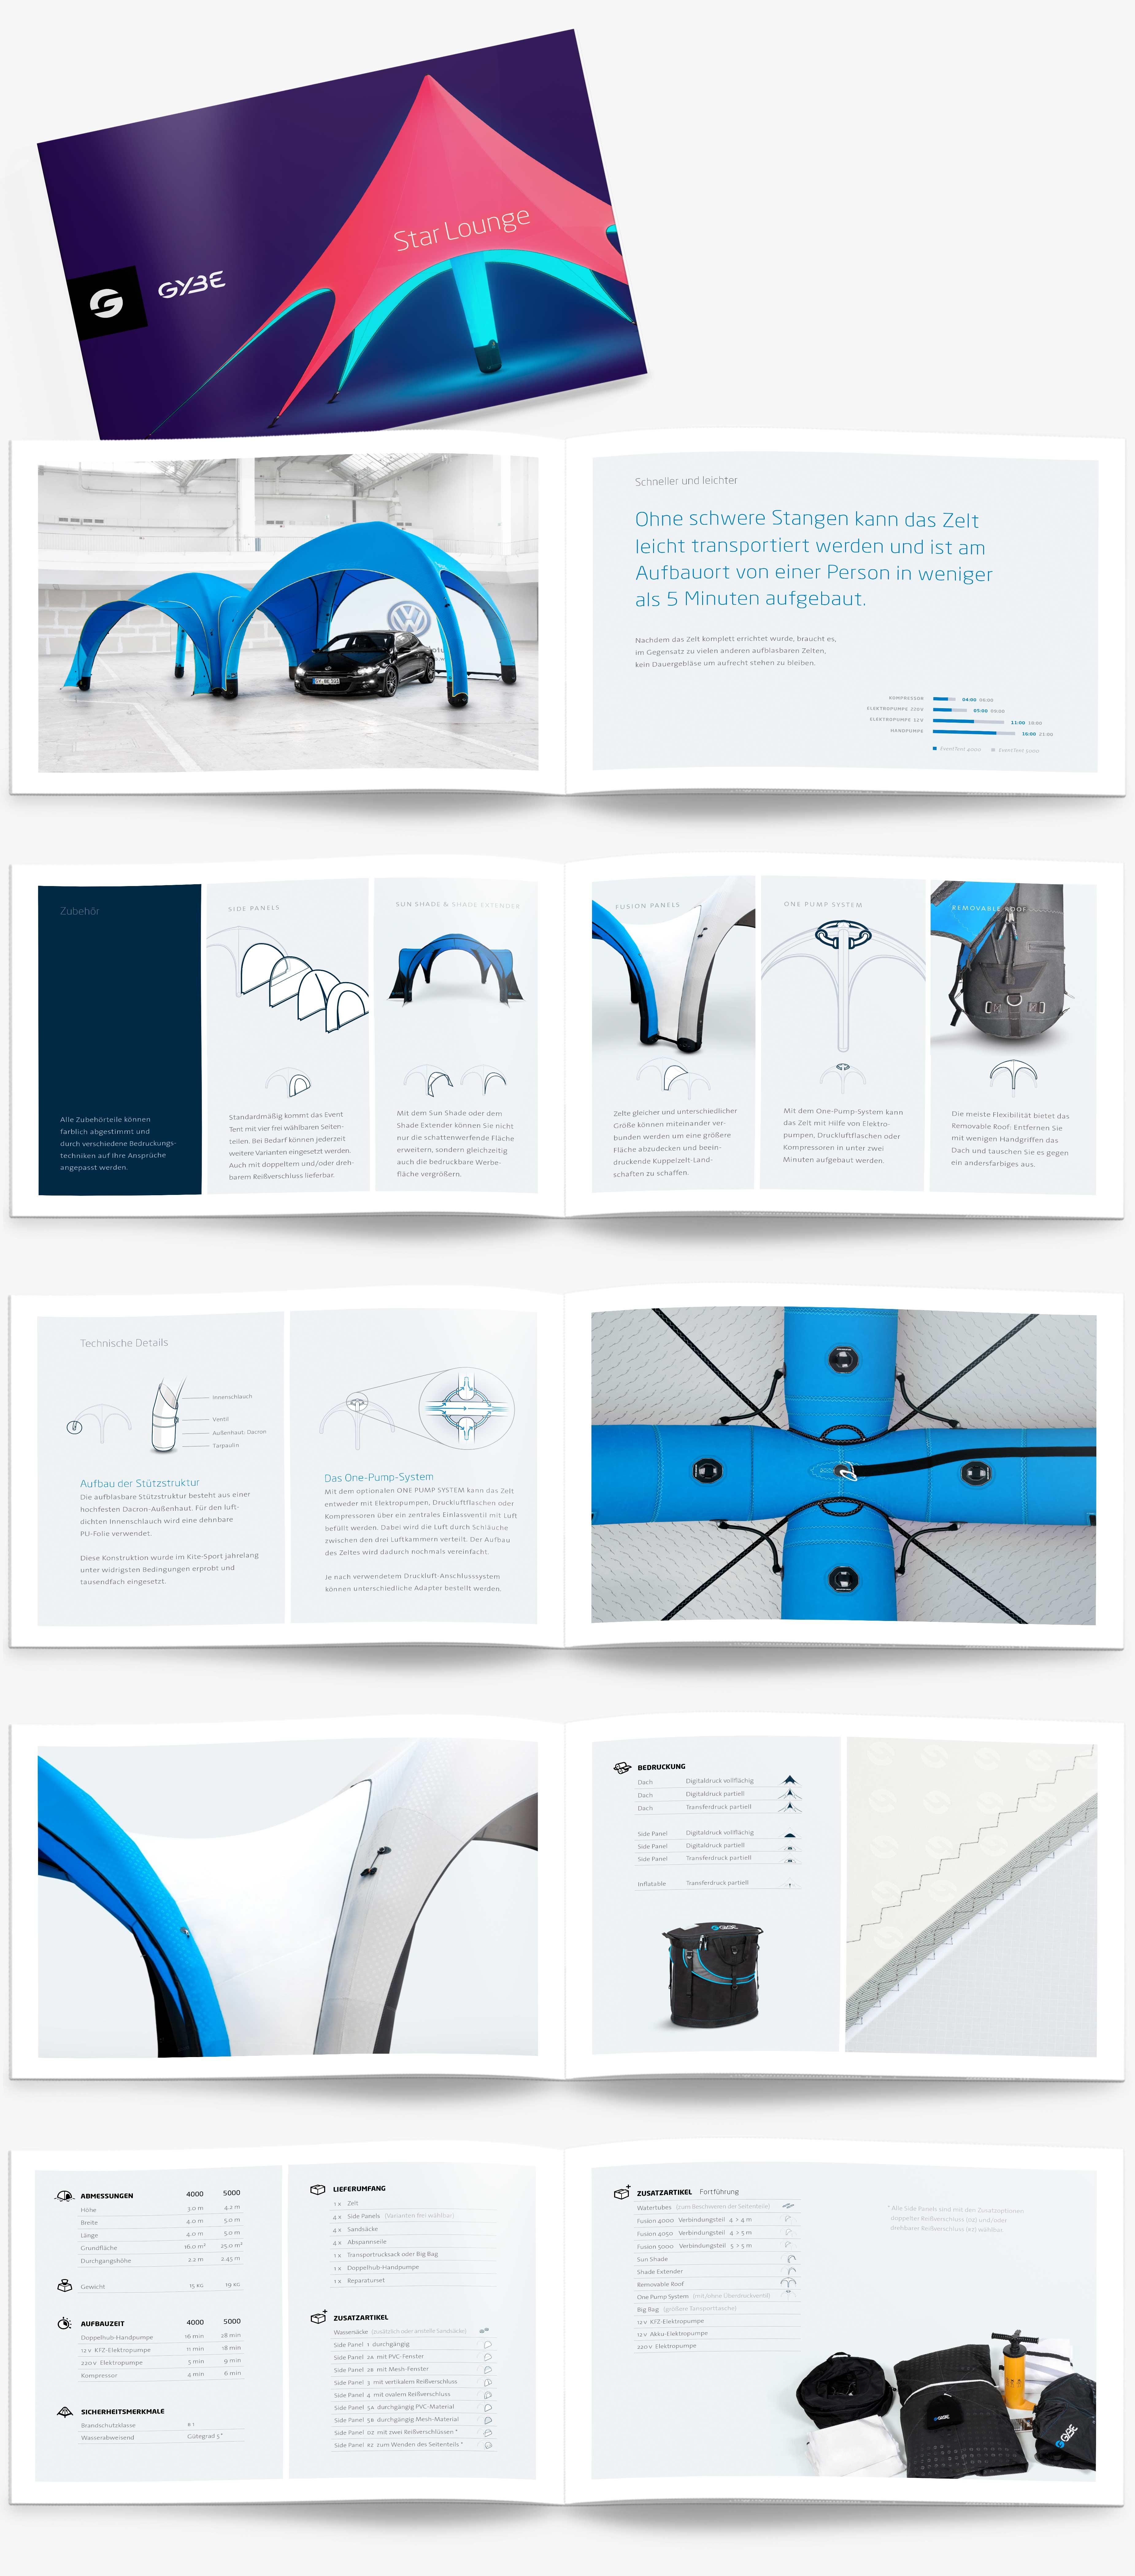 Stunning Ikea Katalog Küchen Gallery - Ridgewayng.com ...